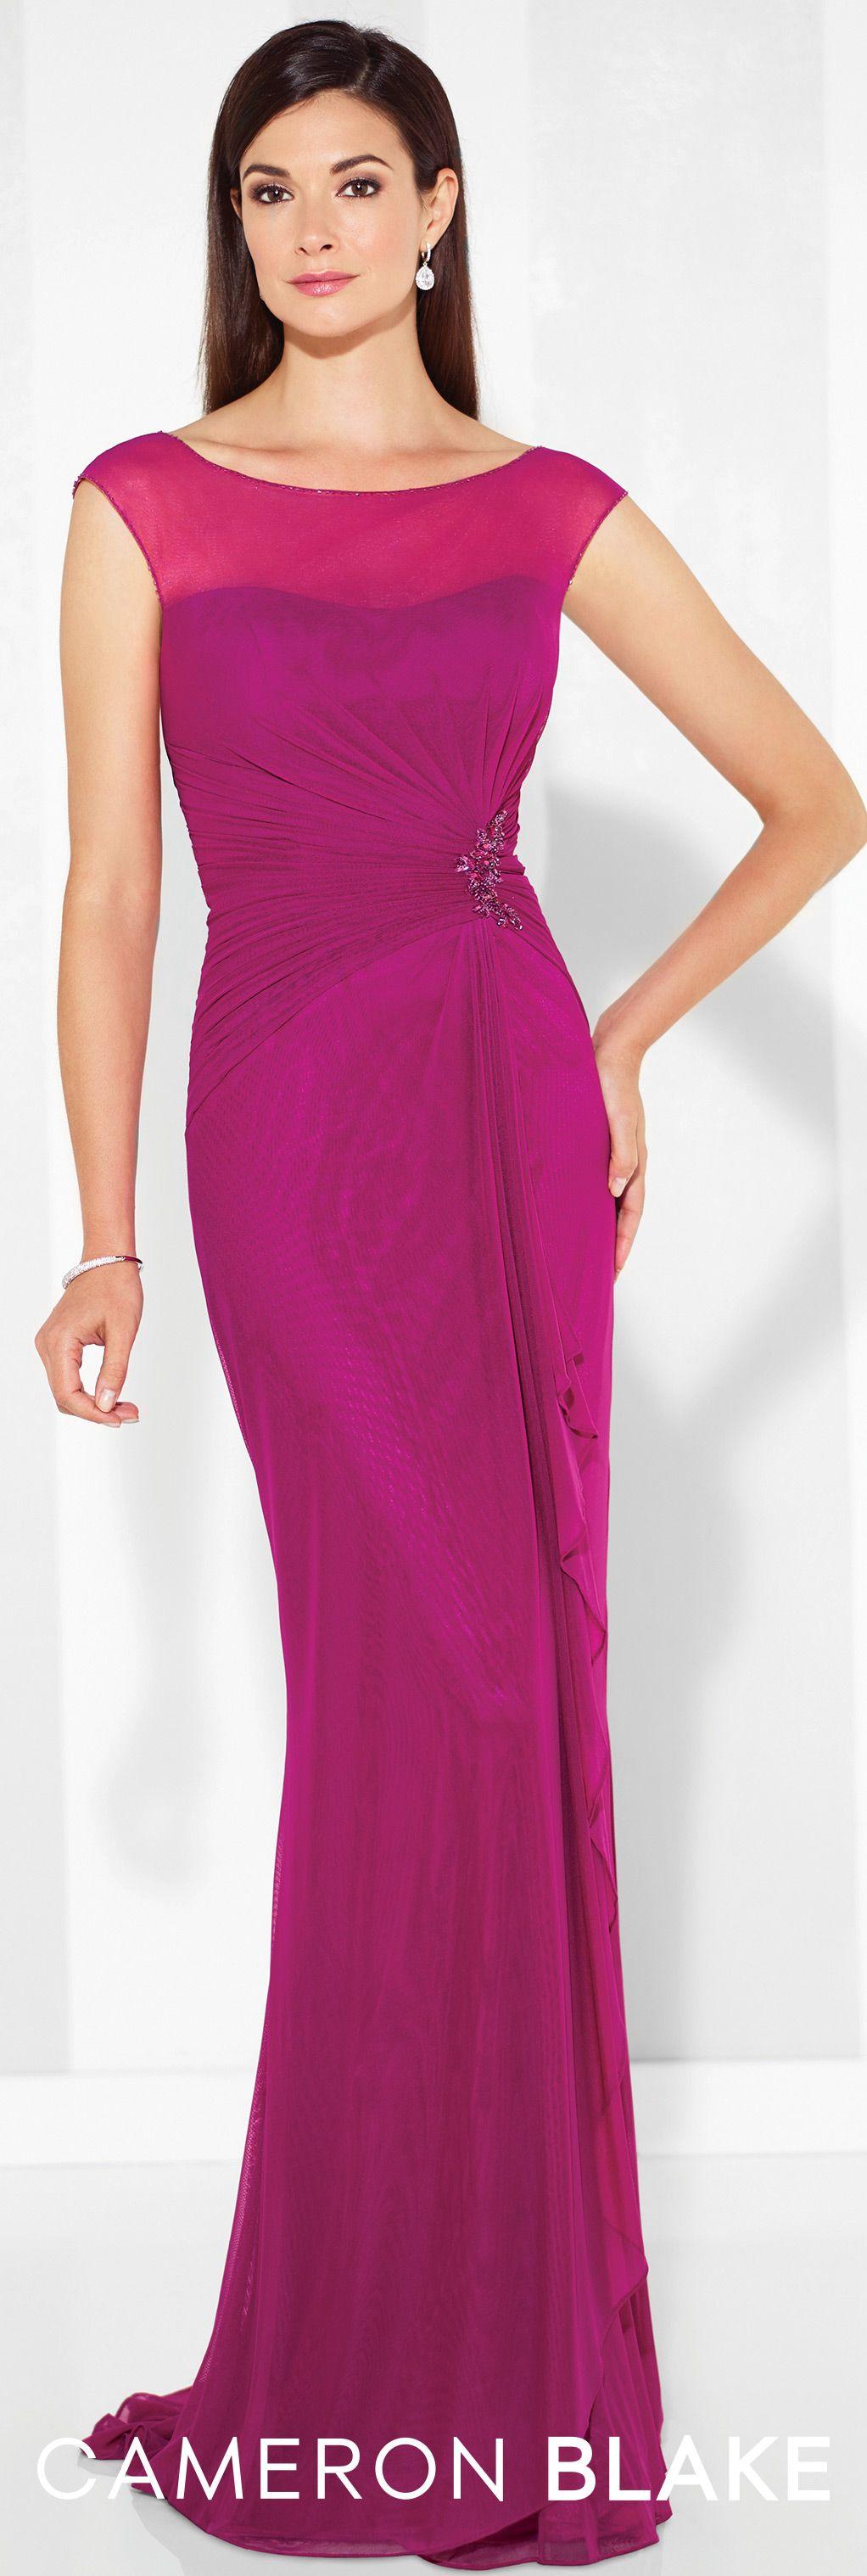 Cameron Blake - Evening Dresses - 117601 | Trajes fiesta, Vestiditos ...